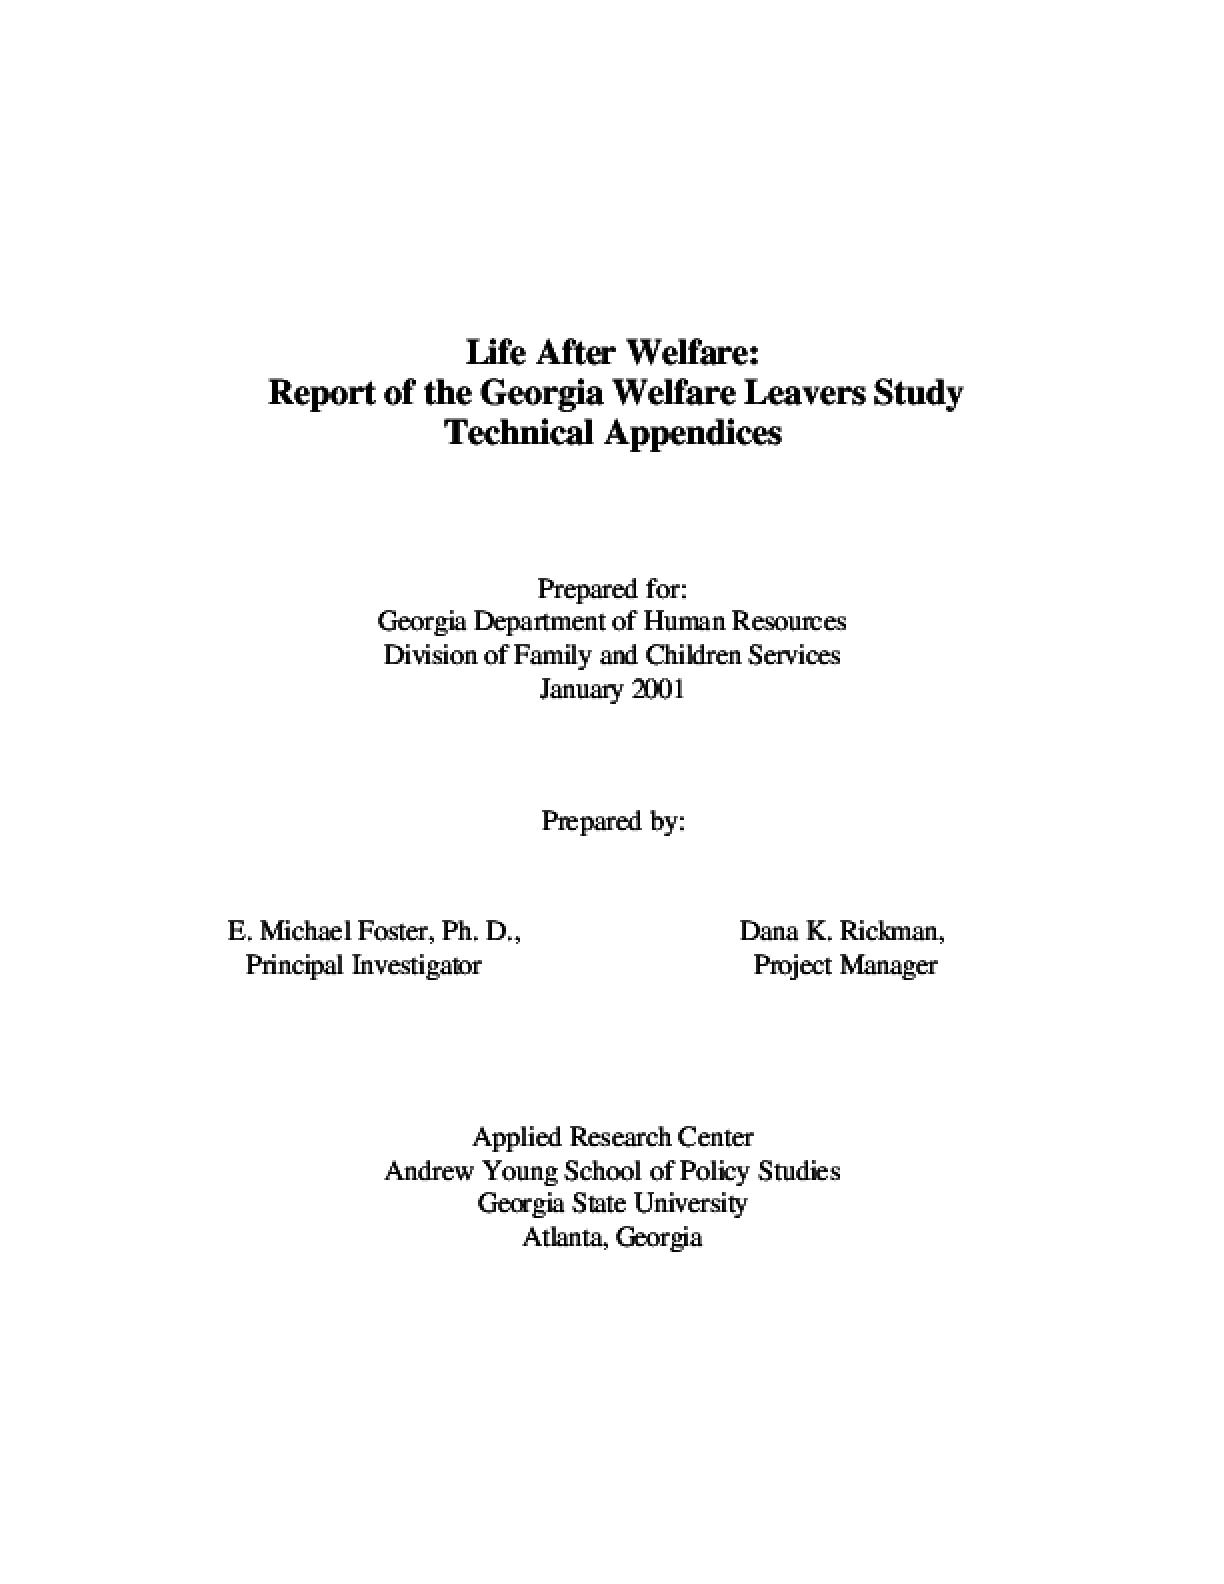 Georgia Welfare Leavers Study - (Life After Welfare) Technical Appendix